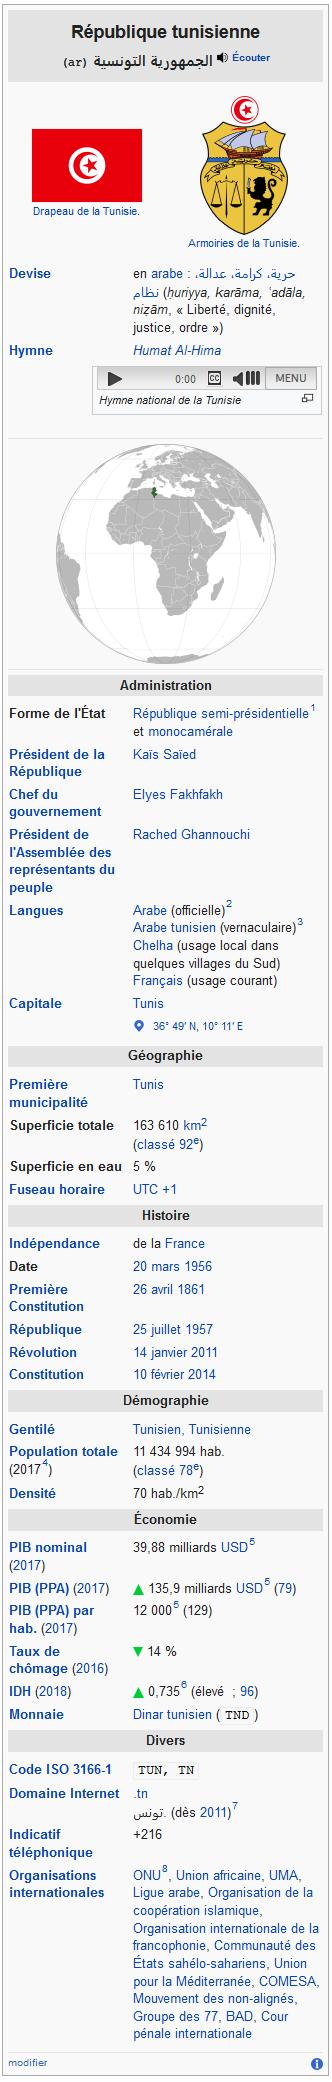 Screenshot_2020-05-05 Tunisie — Wikipédi